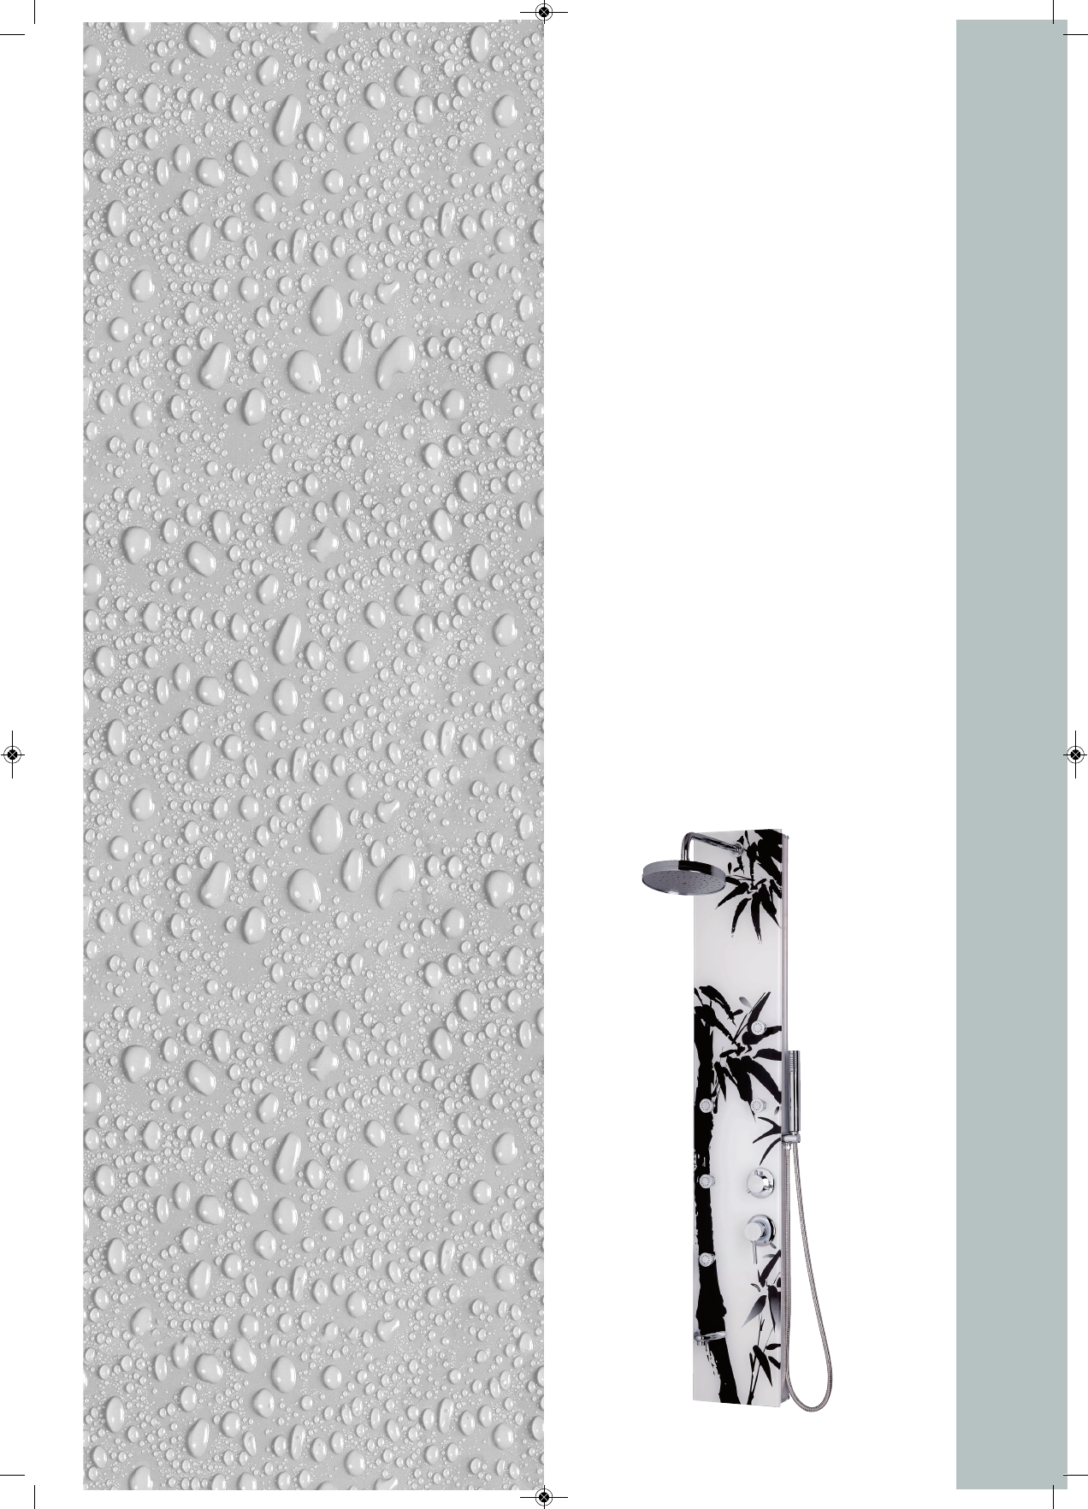 Large Size of Duschsäulen Eisl Sanitr Duschsulen Kopfbrausesets Dusche Duschsäulen